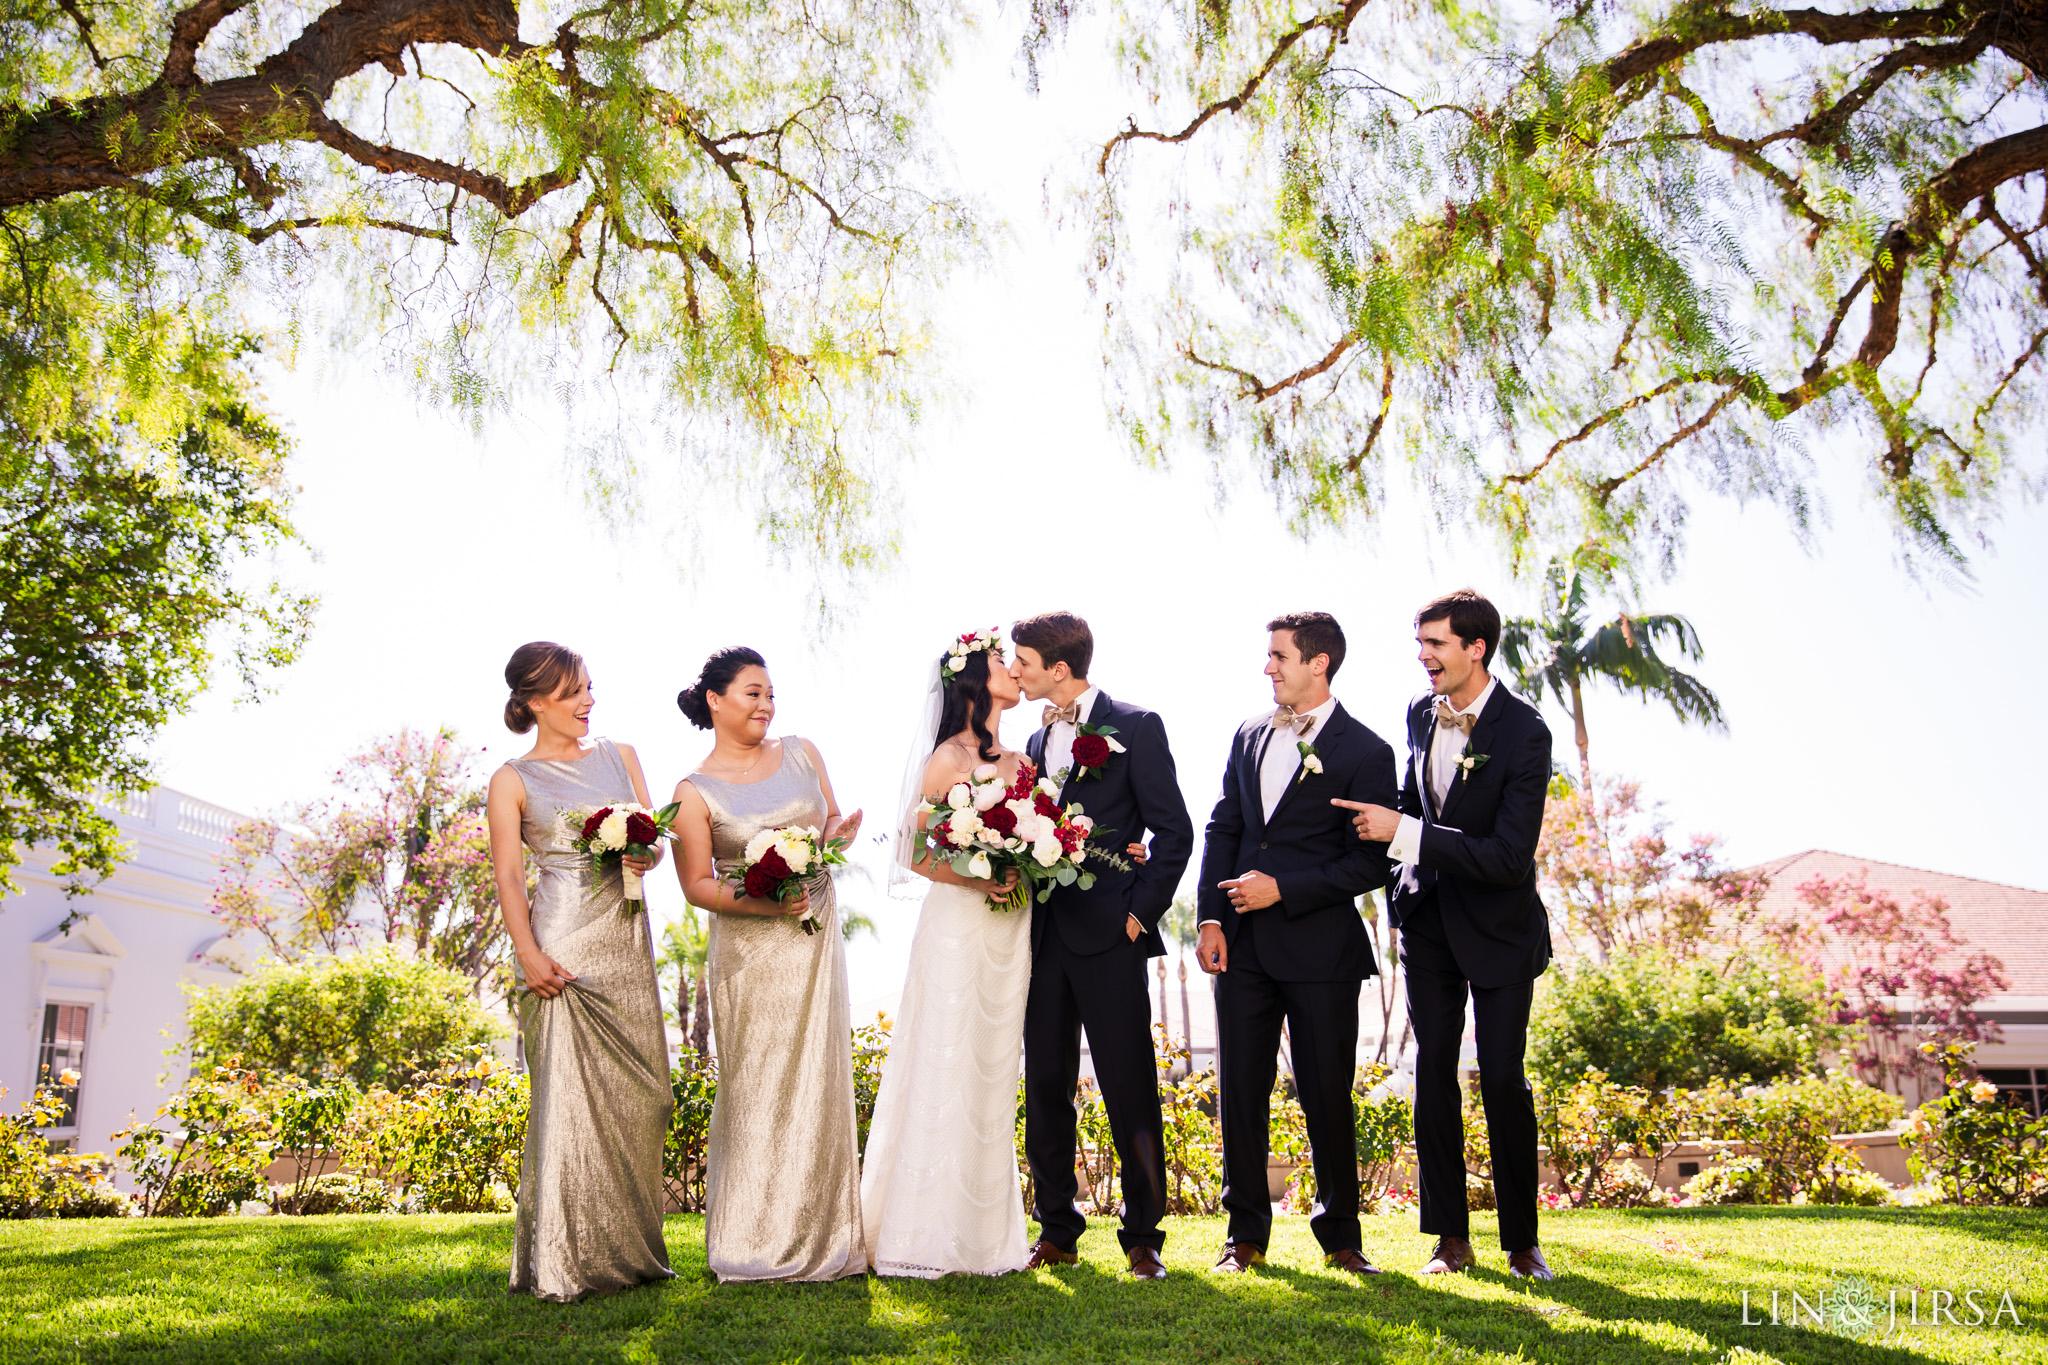 017 richard nixon library wedding party photography